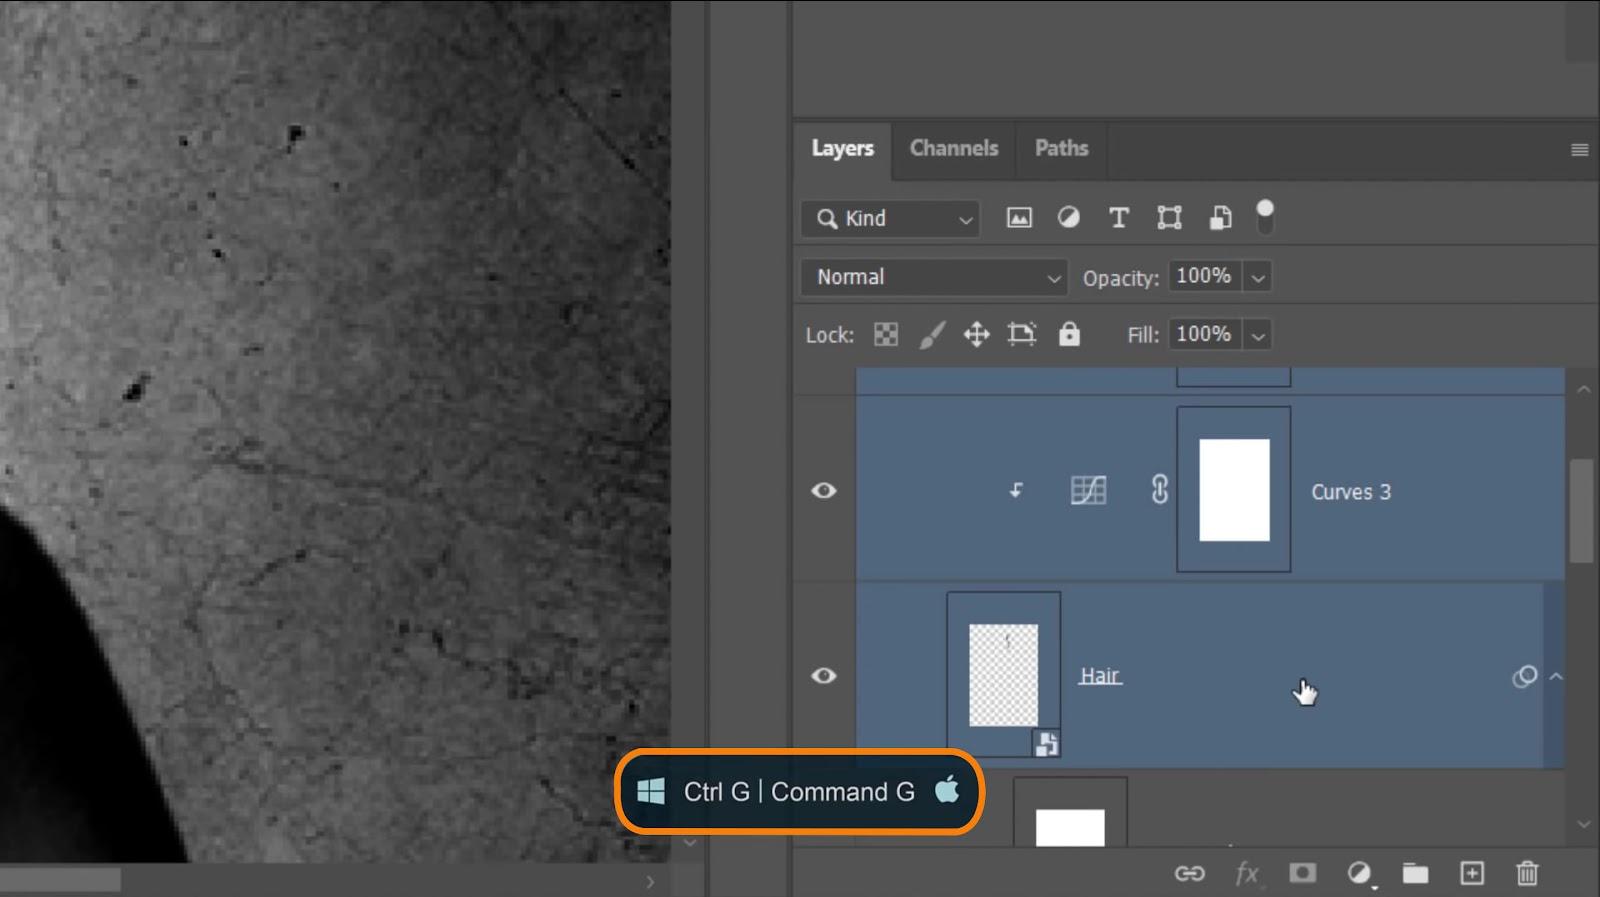 Press Ctrl G on Windows or Command G on Mac